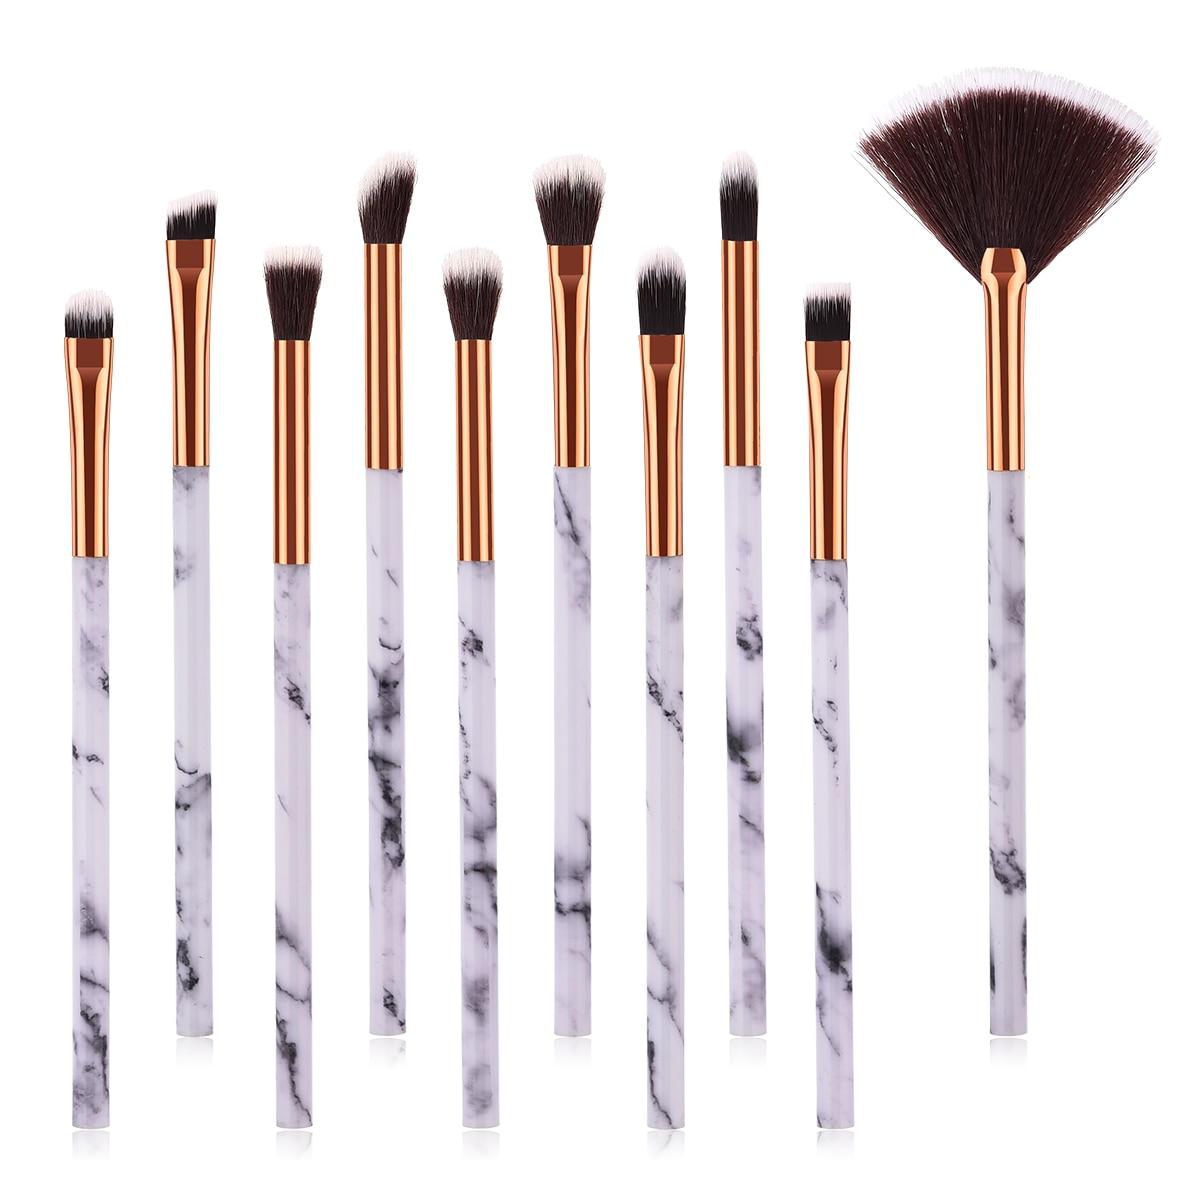 ELECOOL 10/4/1pcs Marble Texture Handle Makeup Brushes Nylon Hair Eye Makeup Brush Cosmetic Eyeshadow Women Beauty Brush Tools